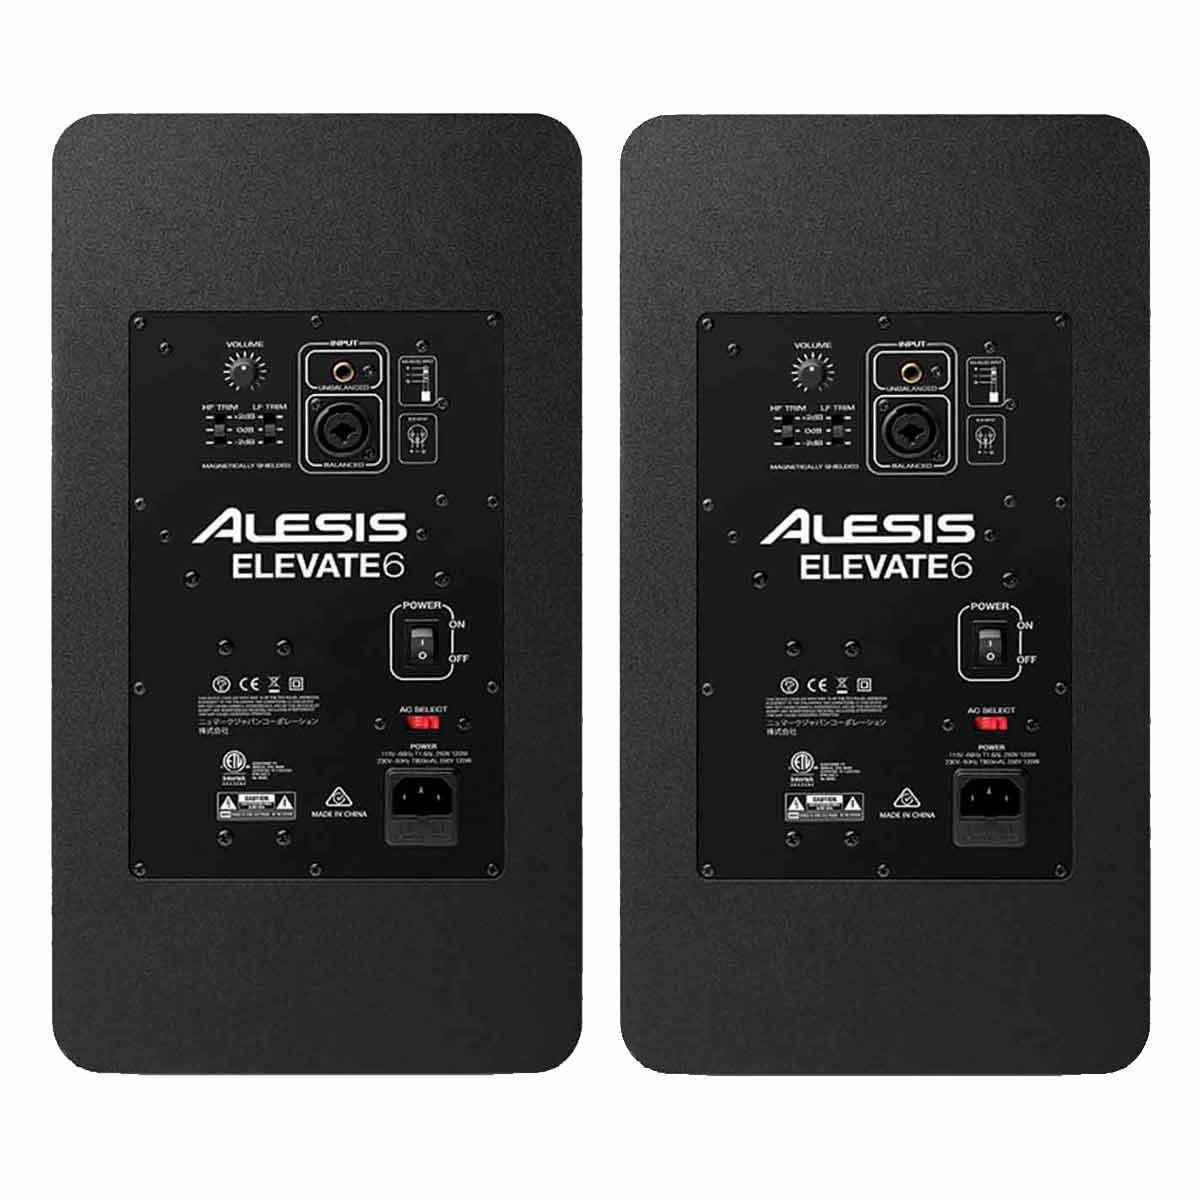 Monitor de Referência Ativo Fal 6,5 Pol 75W (Par) - Elevate 6 Alexis